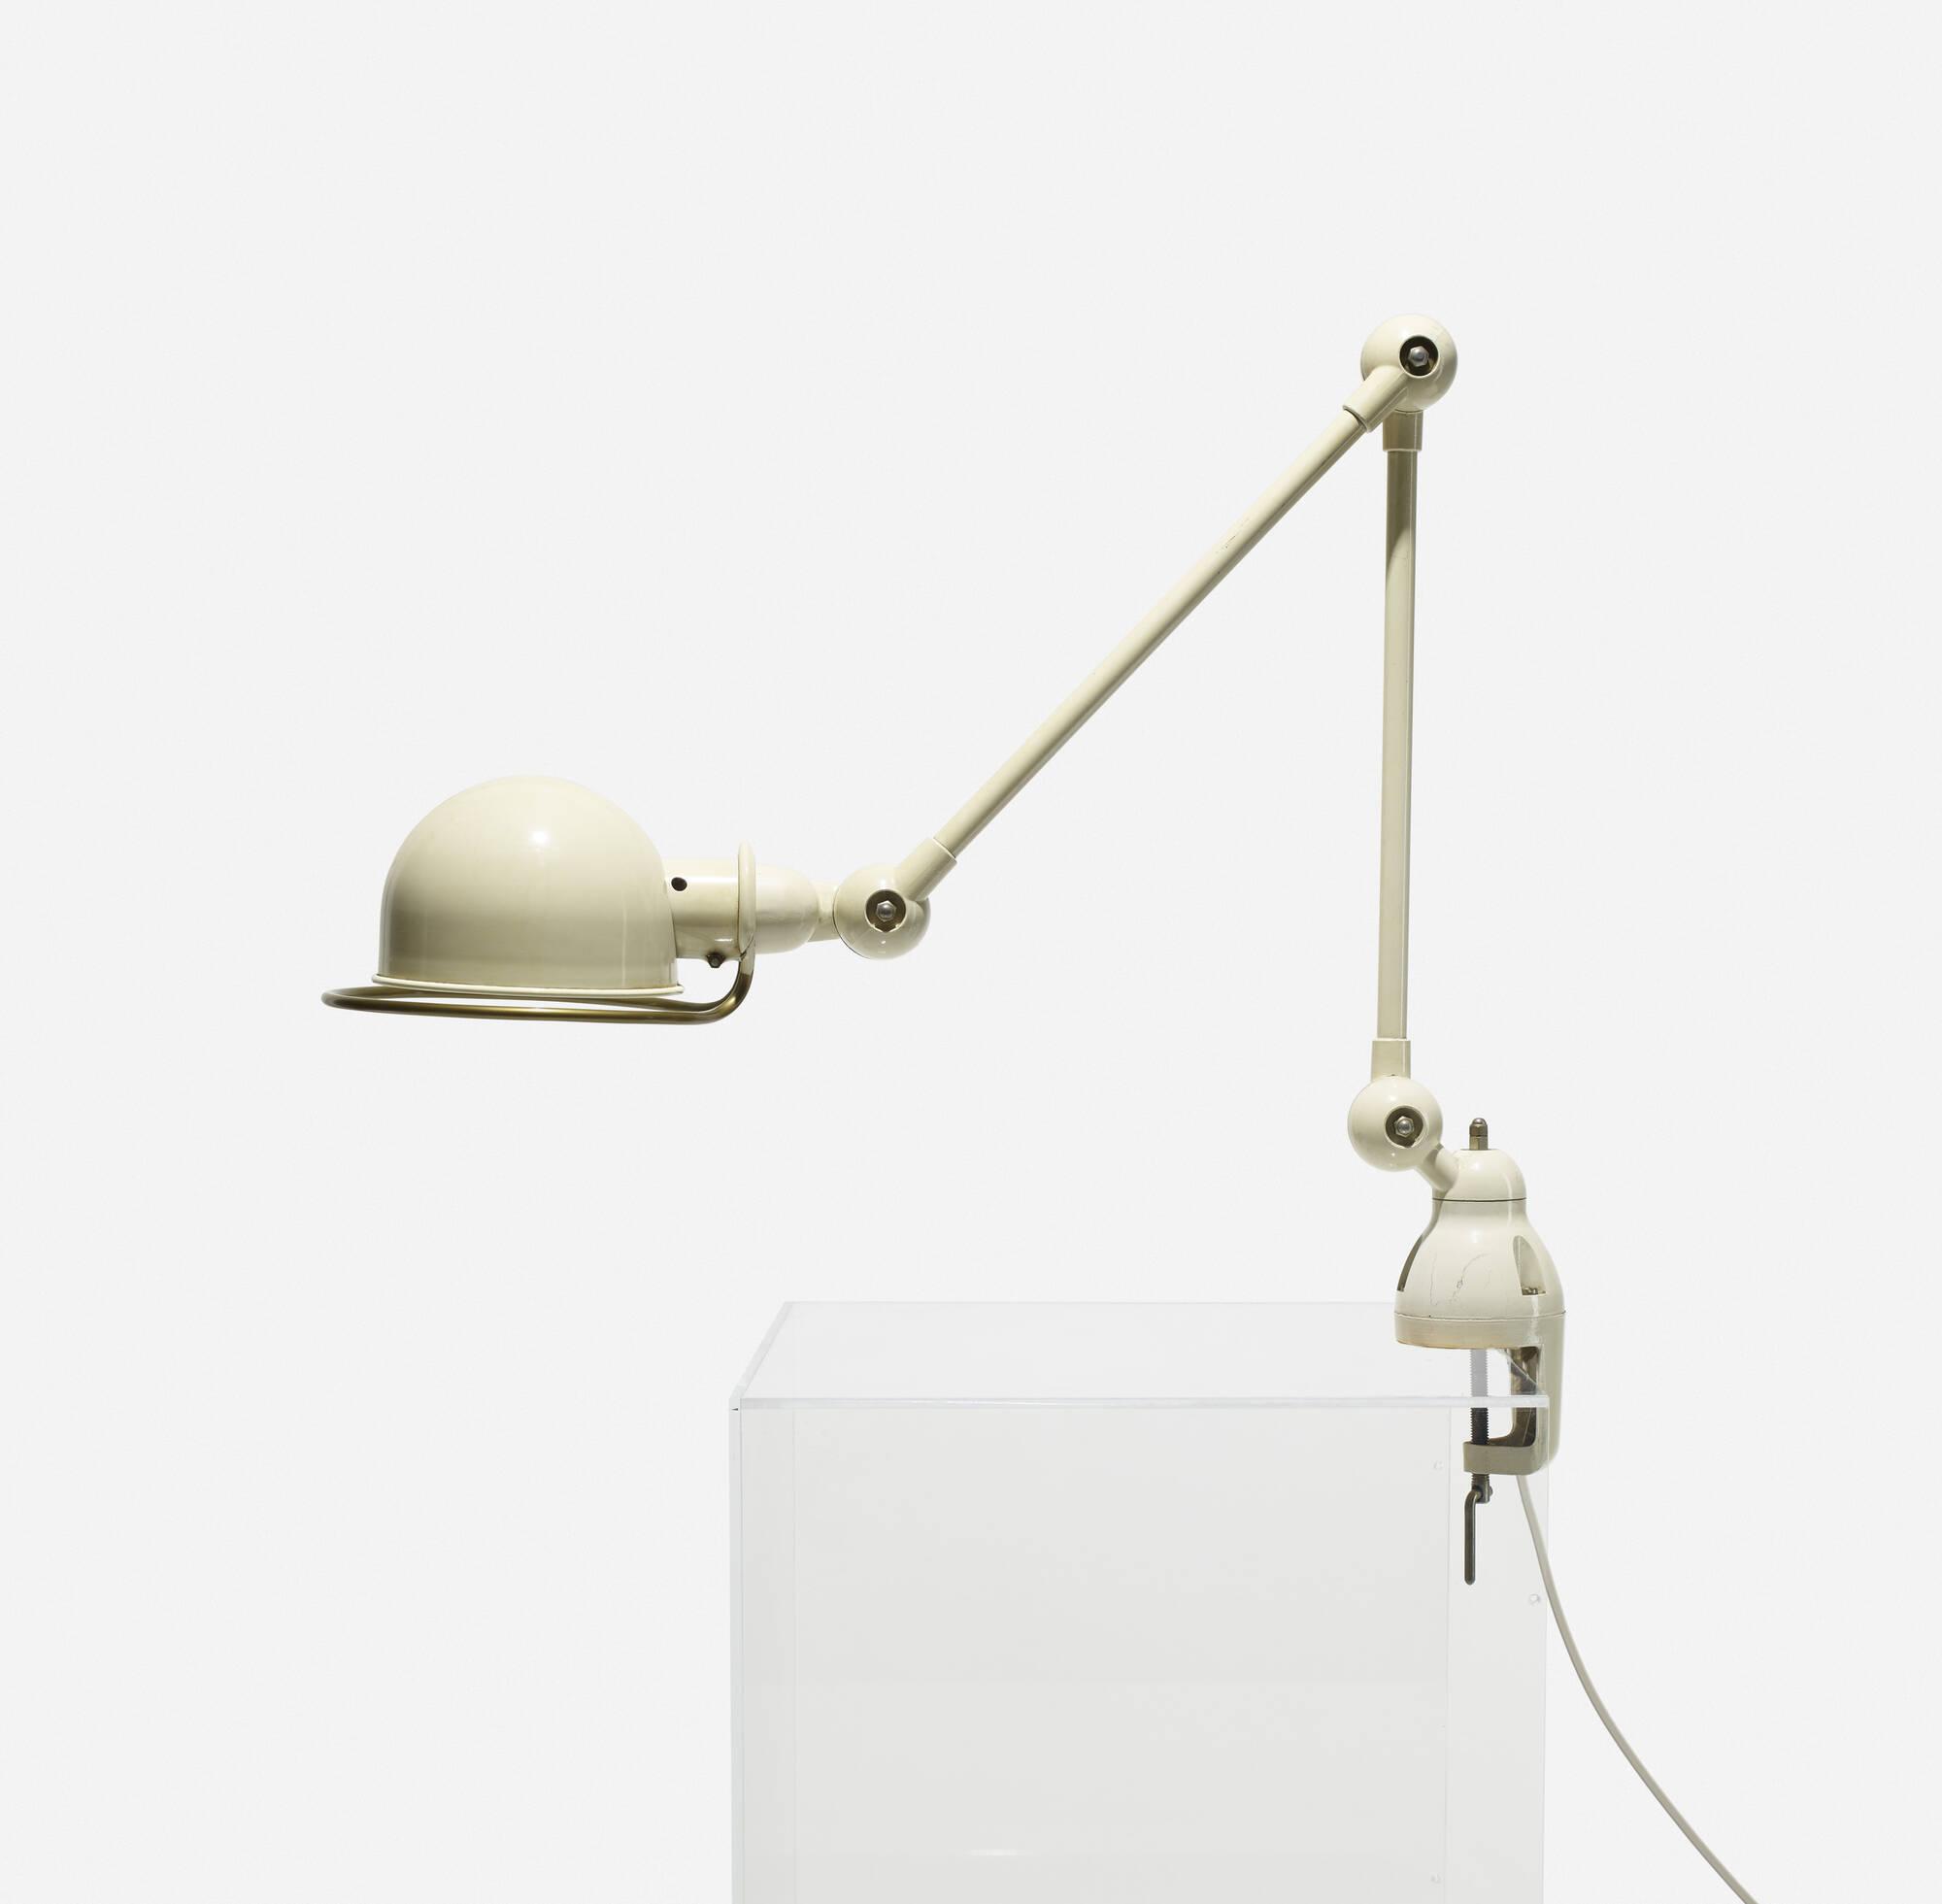 251: Jean-Louis Domecq / Loft vice lamp (1 of 2)